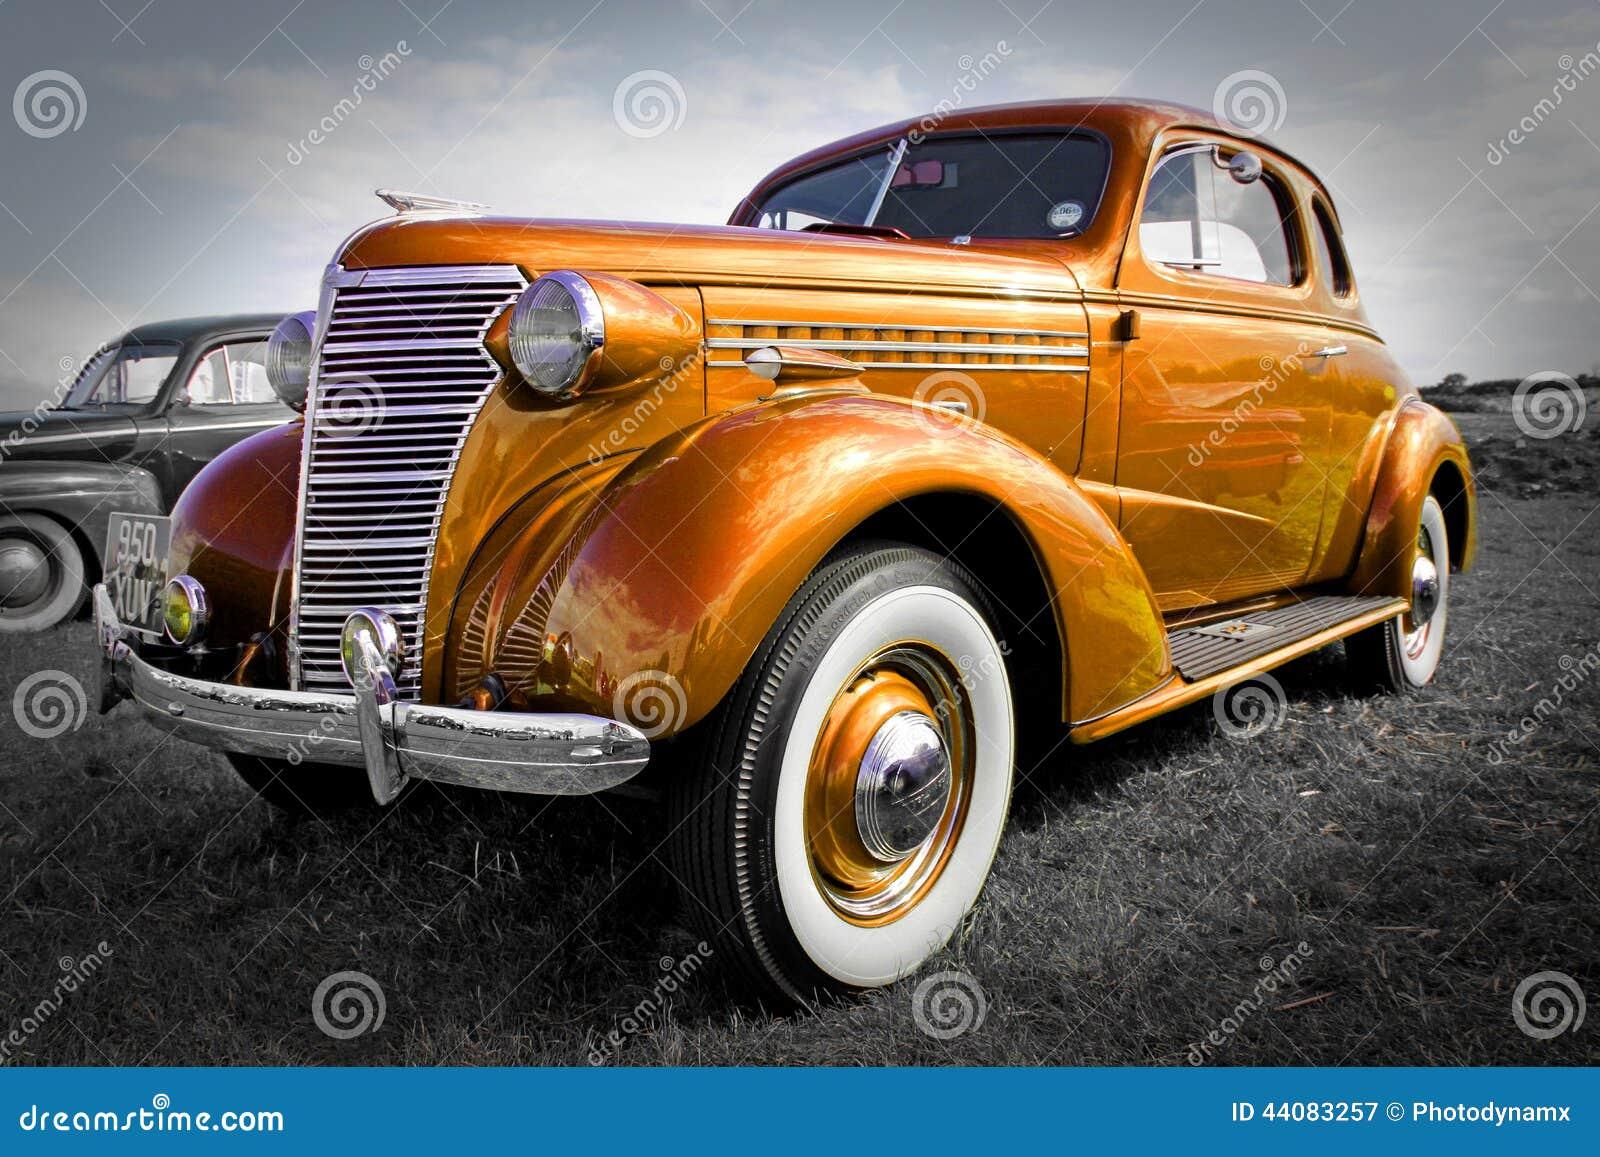 Classic Car Dealer In Boston